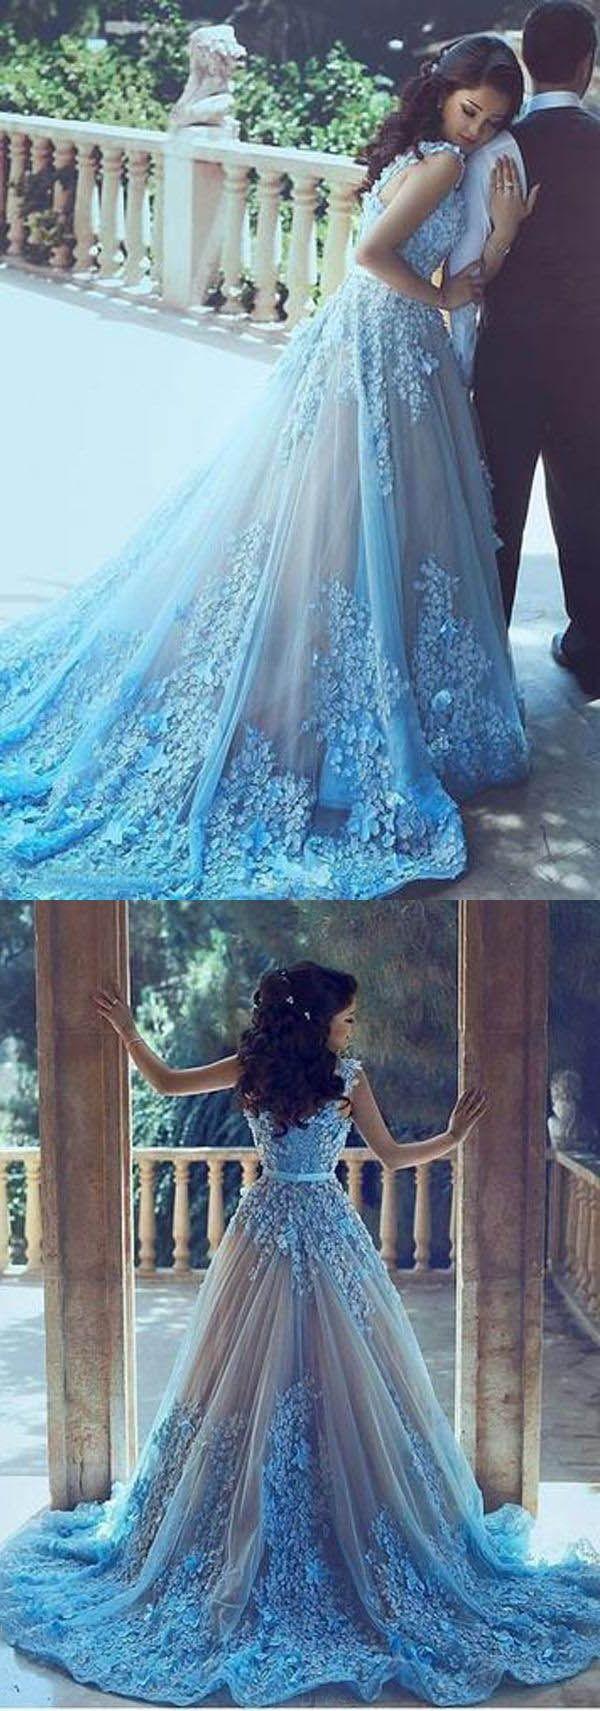 Custom made popular wedding dresses blue aline square chapel train